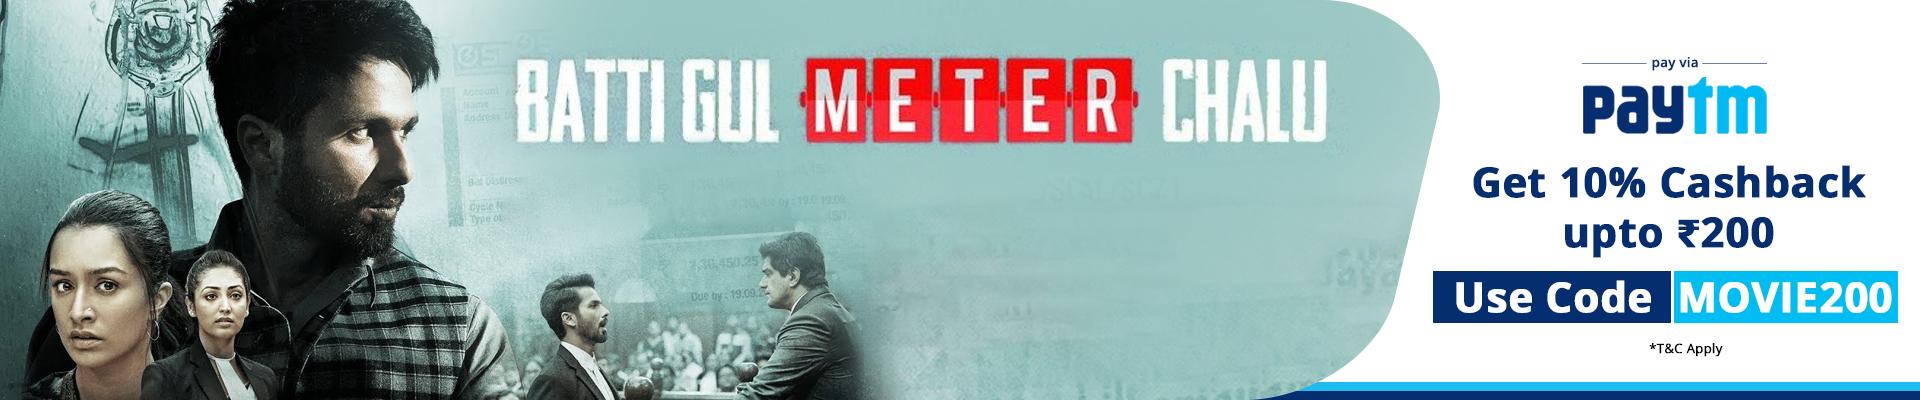 Batti Gul Meter chalu banner